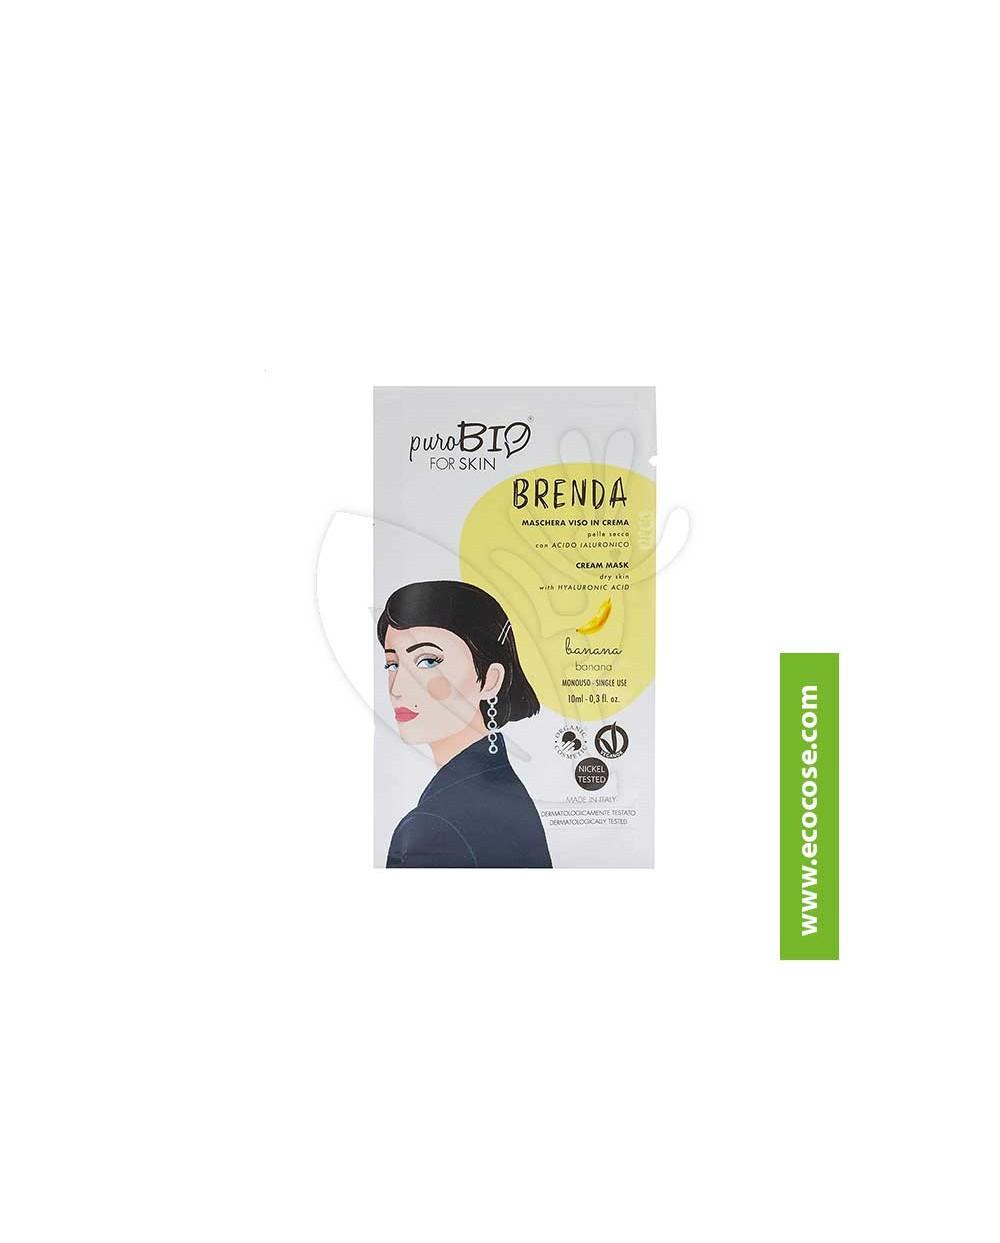 PuroBIO for skin - BRENDA - Maschera viso in crema - 01 Mandorla